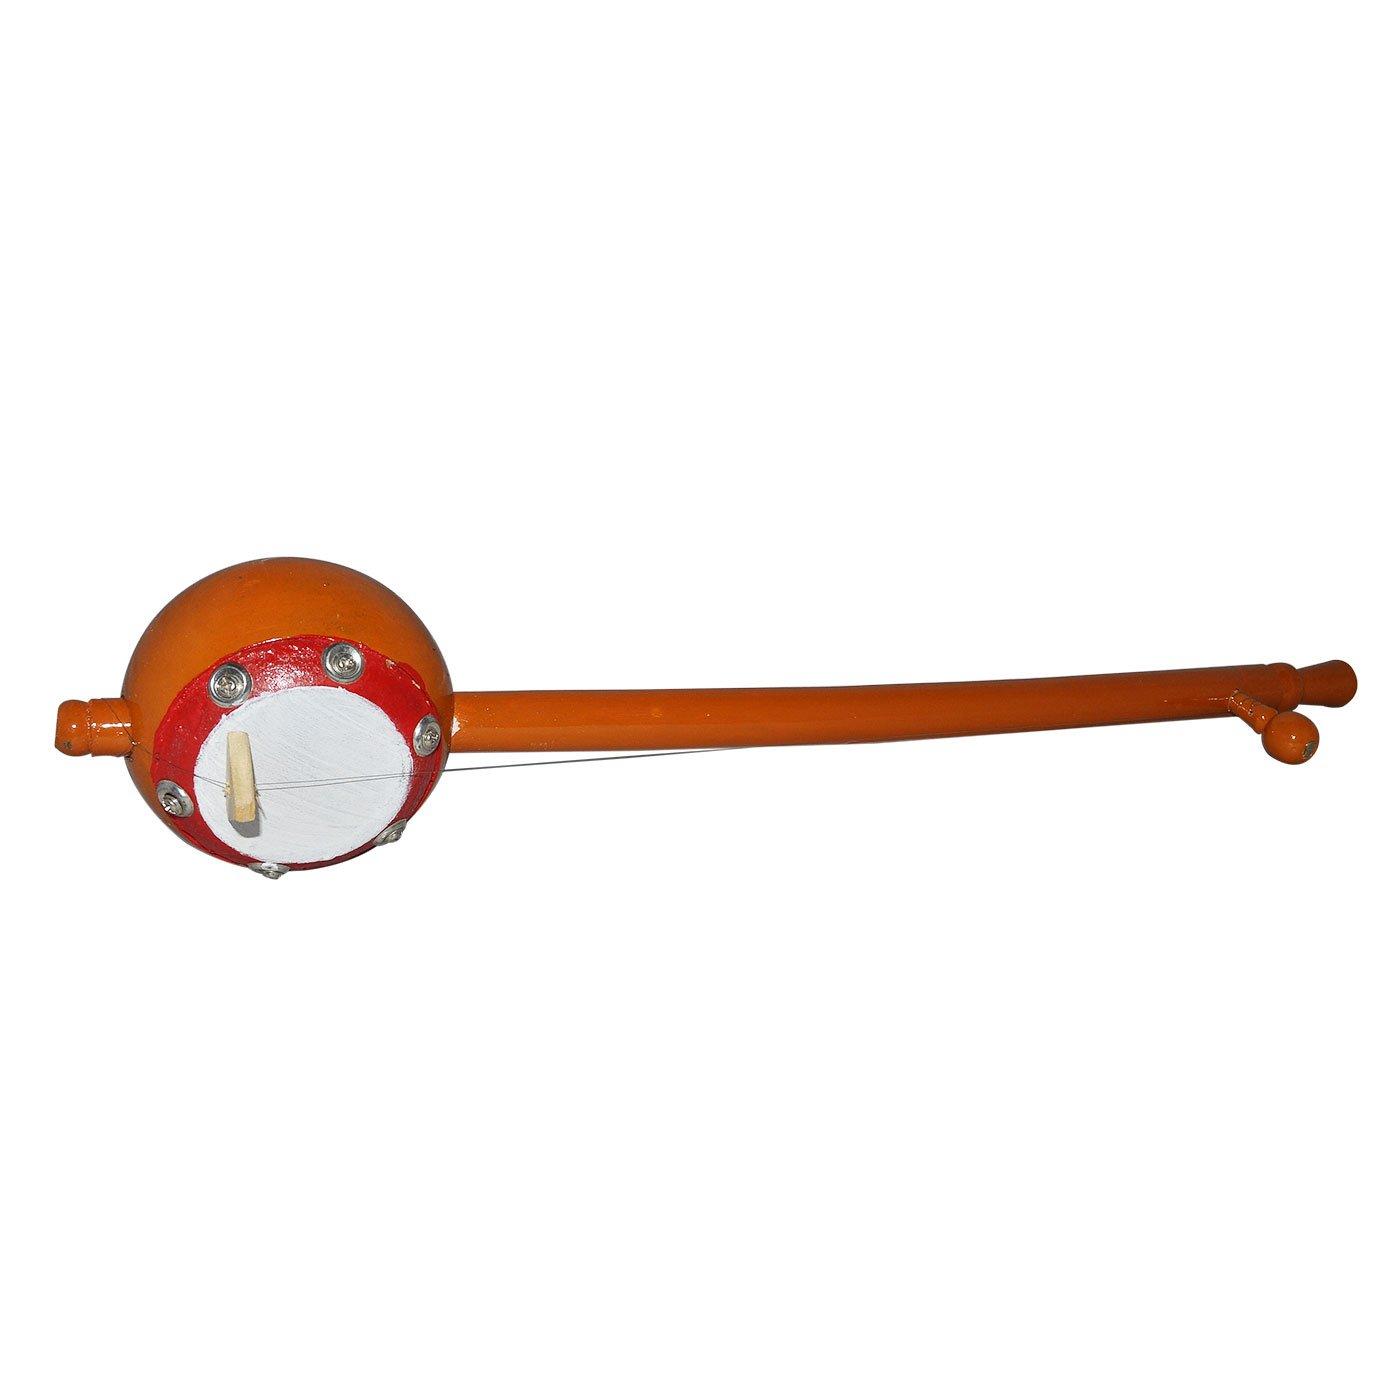 Handmade Wooden Ektara Single String Indian Folk Instrument